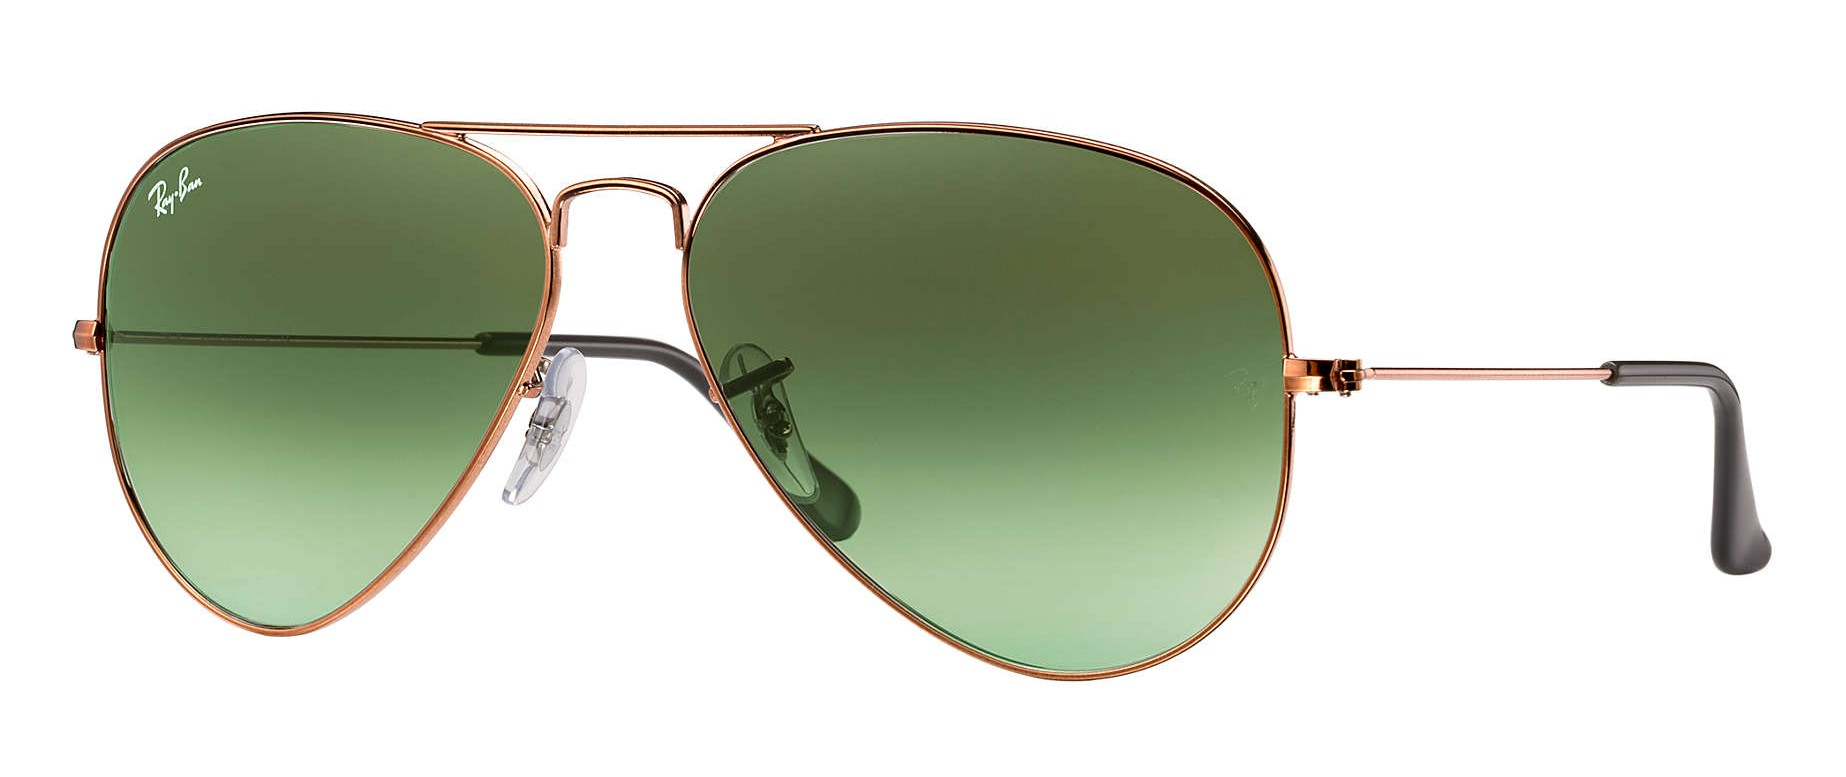 54b61f4e19 Ray-Ban - RB3025 9002A6 - Original Aviator Gradient - Bronze-Copper - Green  Gradient Lenses - Sunglass - Ray-Ban Eyewear - Avvenice